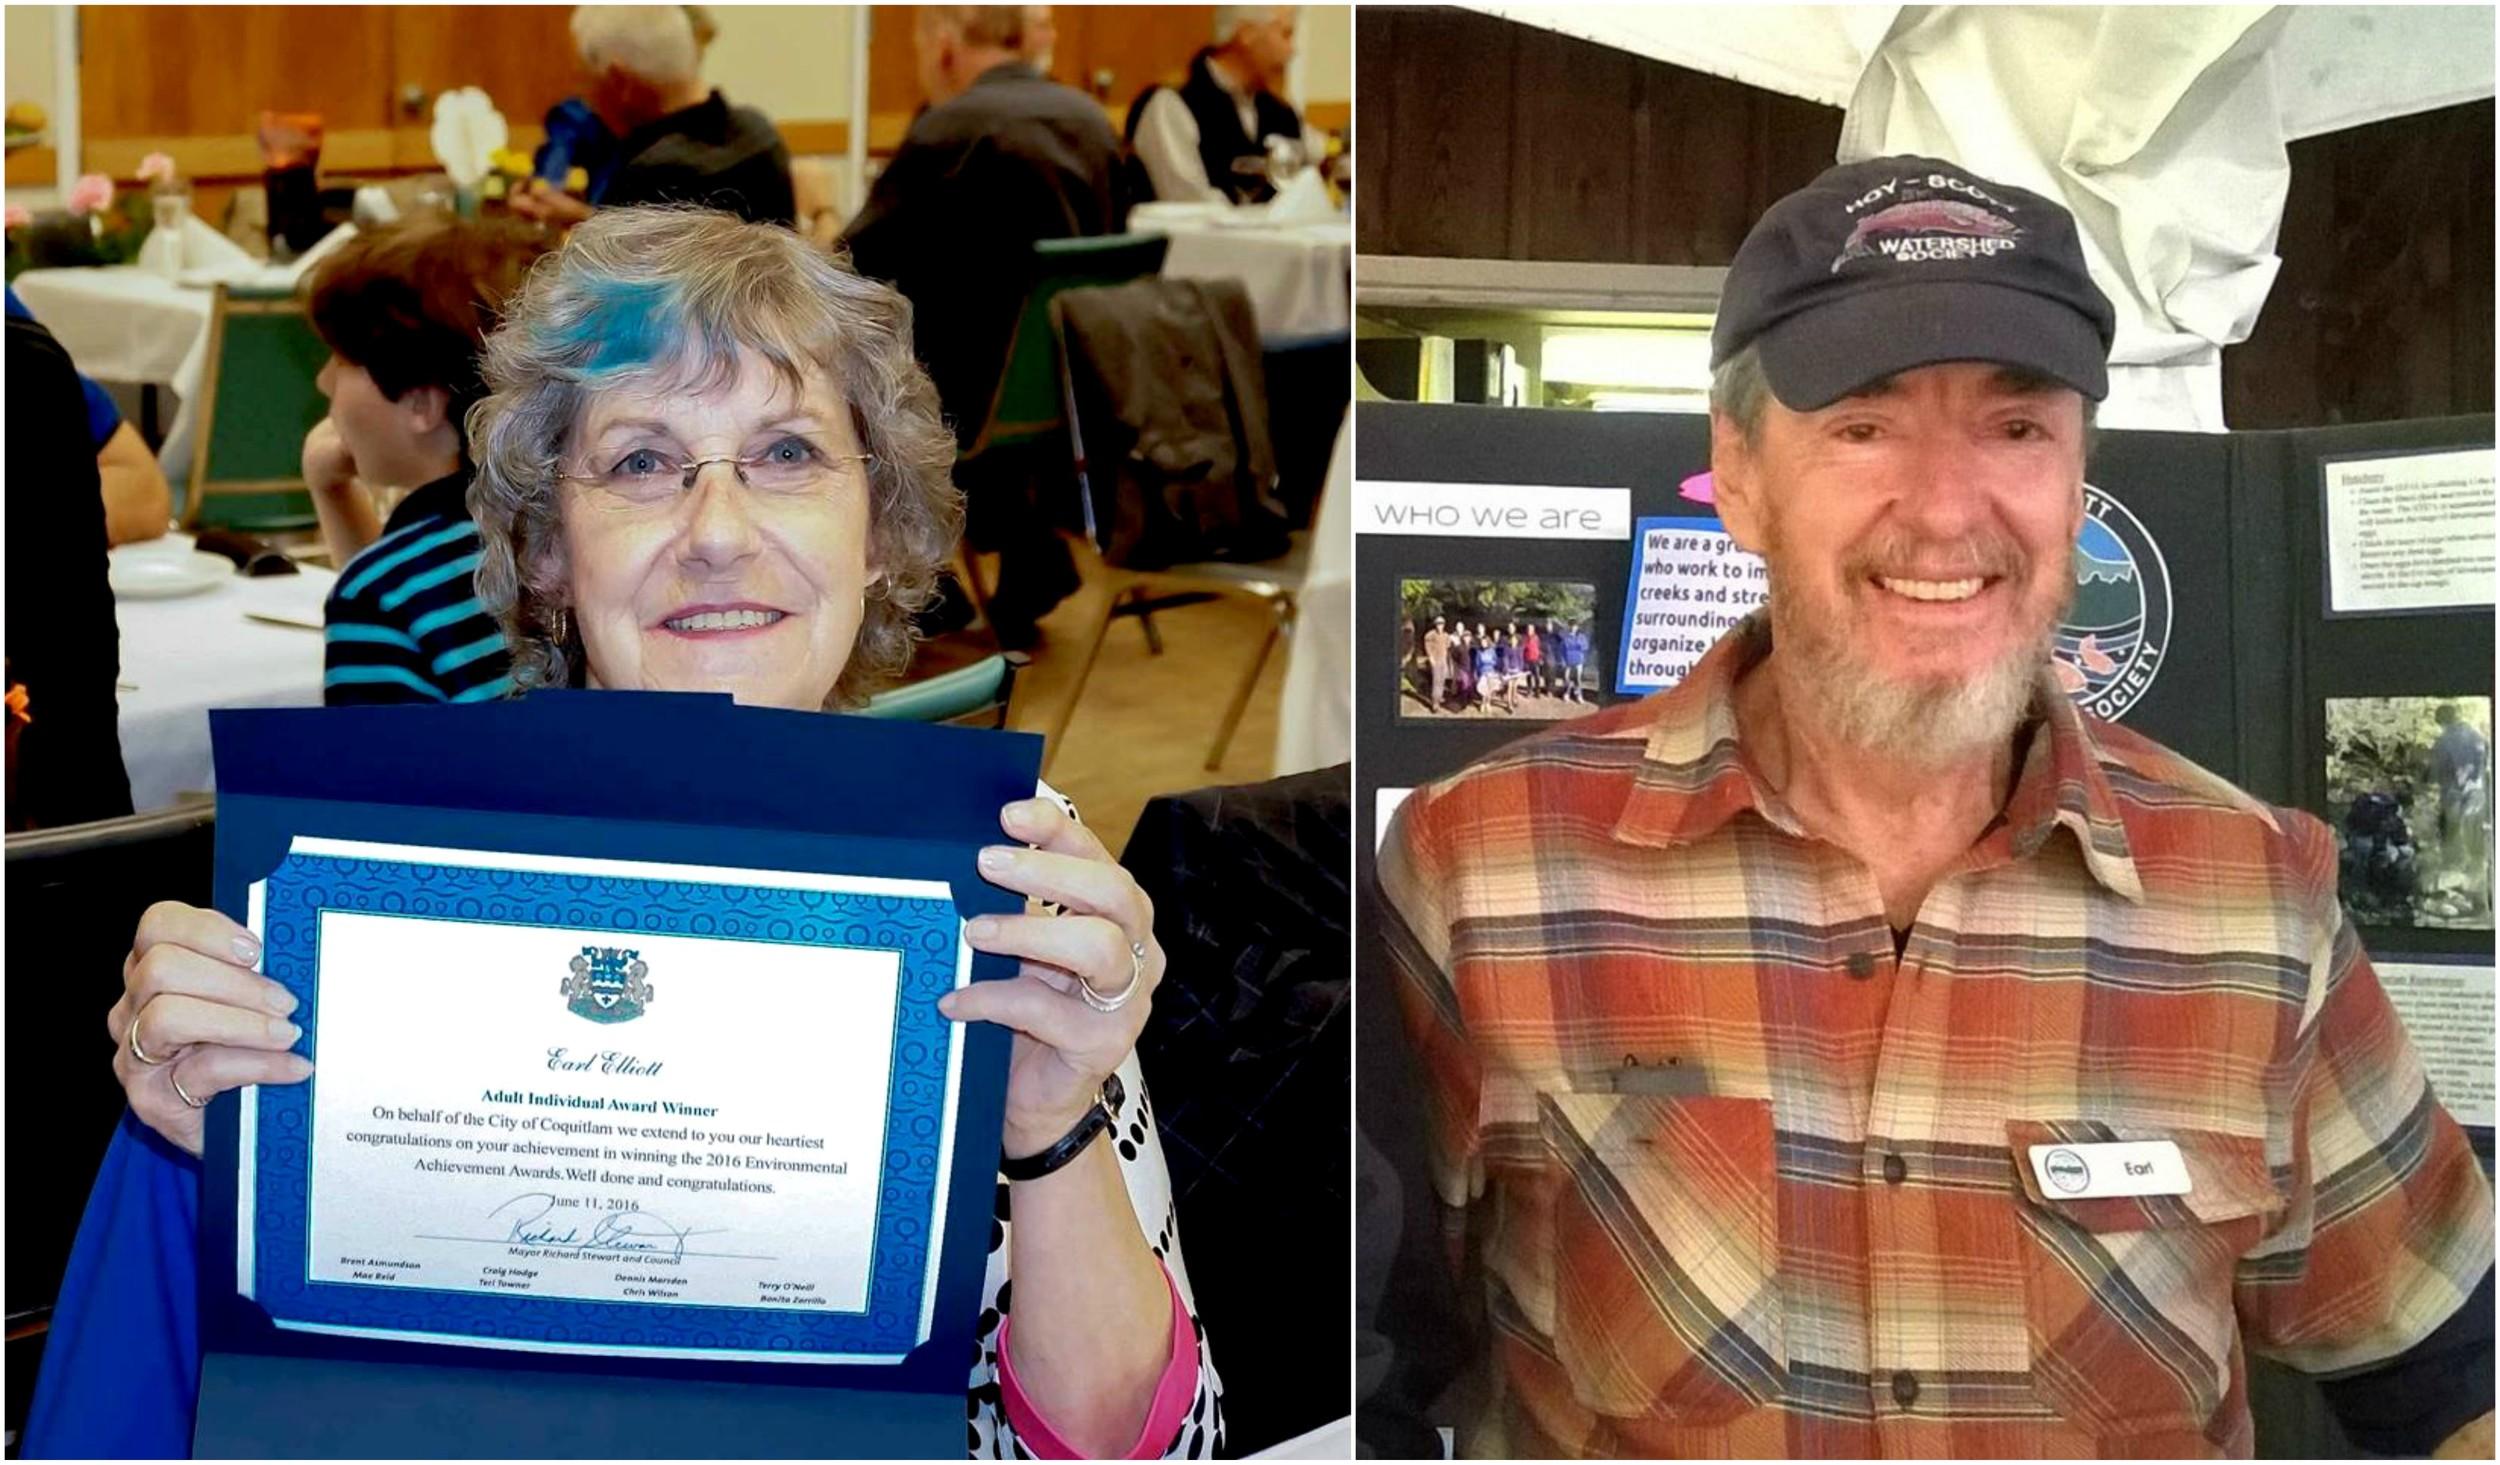 Lilian Elliott accepted her husband Earl's award certificate on his behalf.